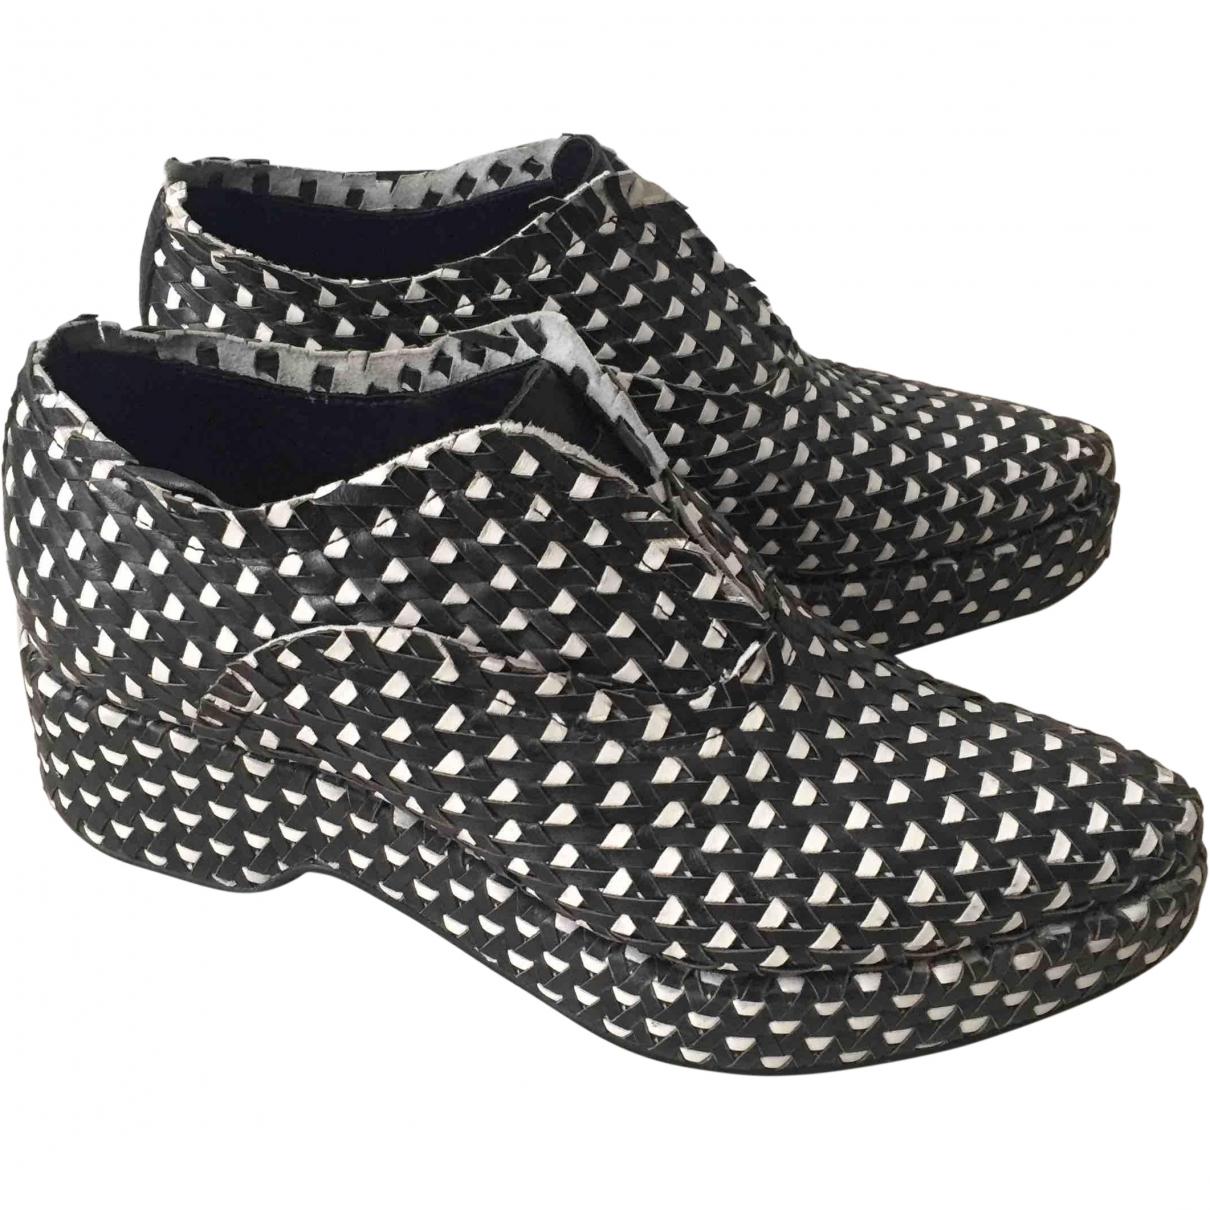 Acne Studios \N Multicolour Leather Mules & Clogs for Women 41.5 EU